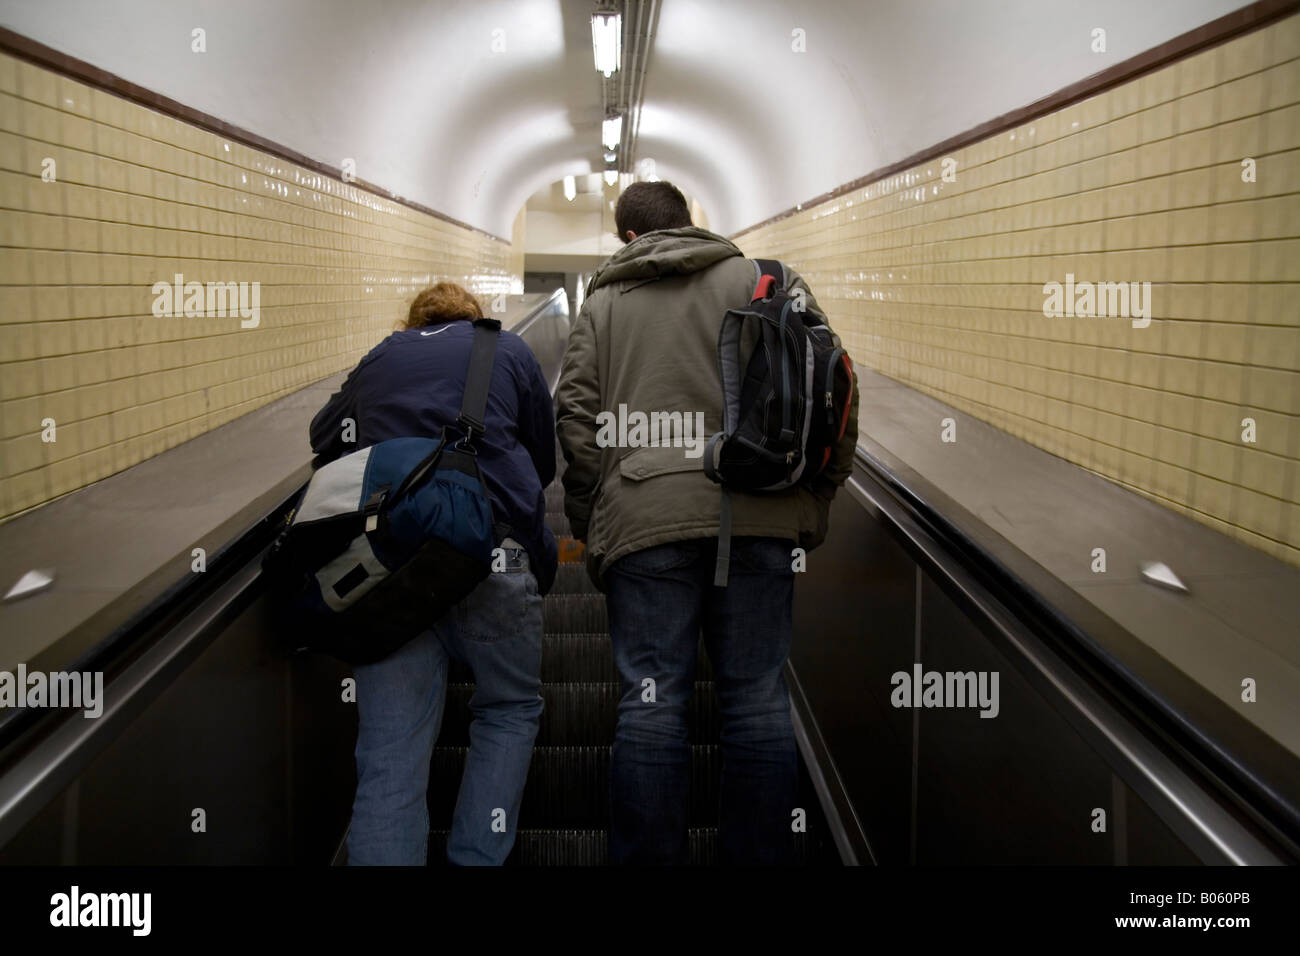 Escalator in the metro, Paris France. - Stock Image